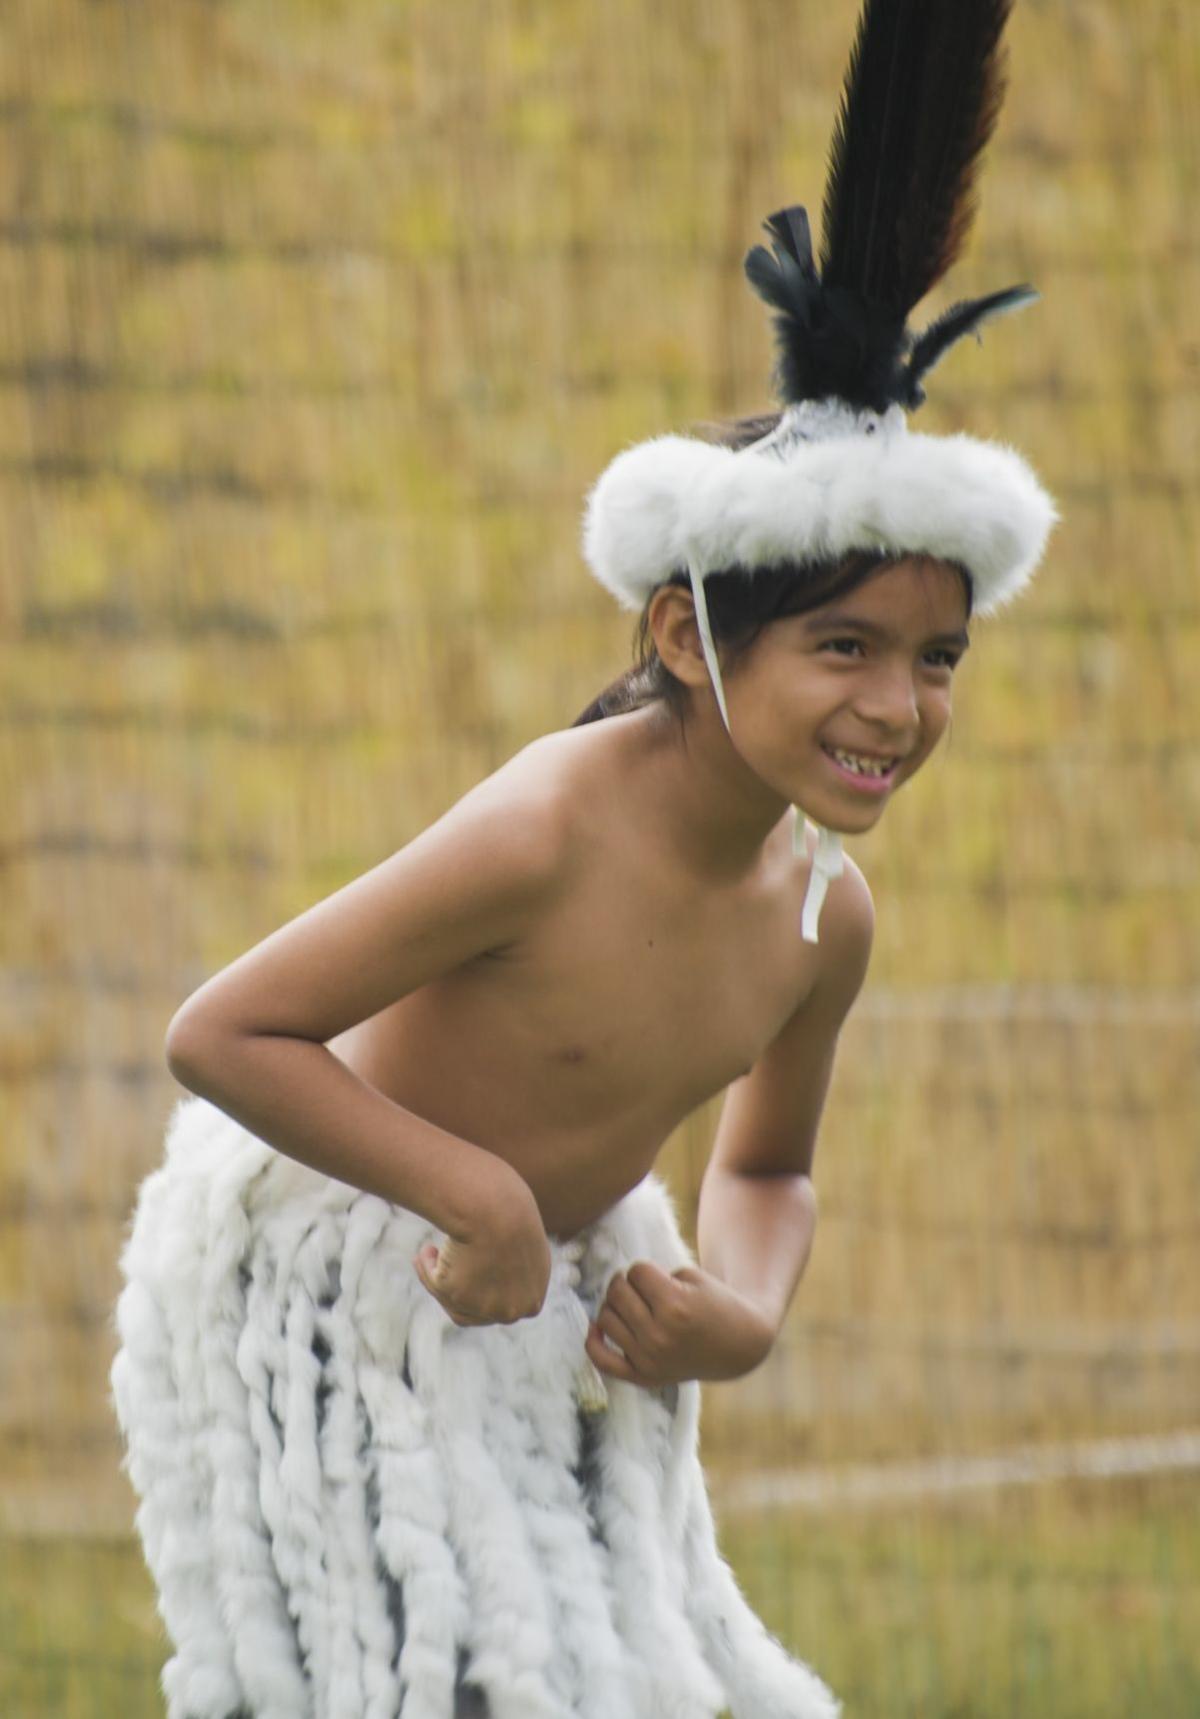 Chumash Culture Day dancer